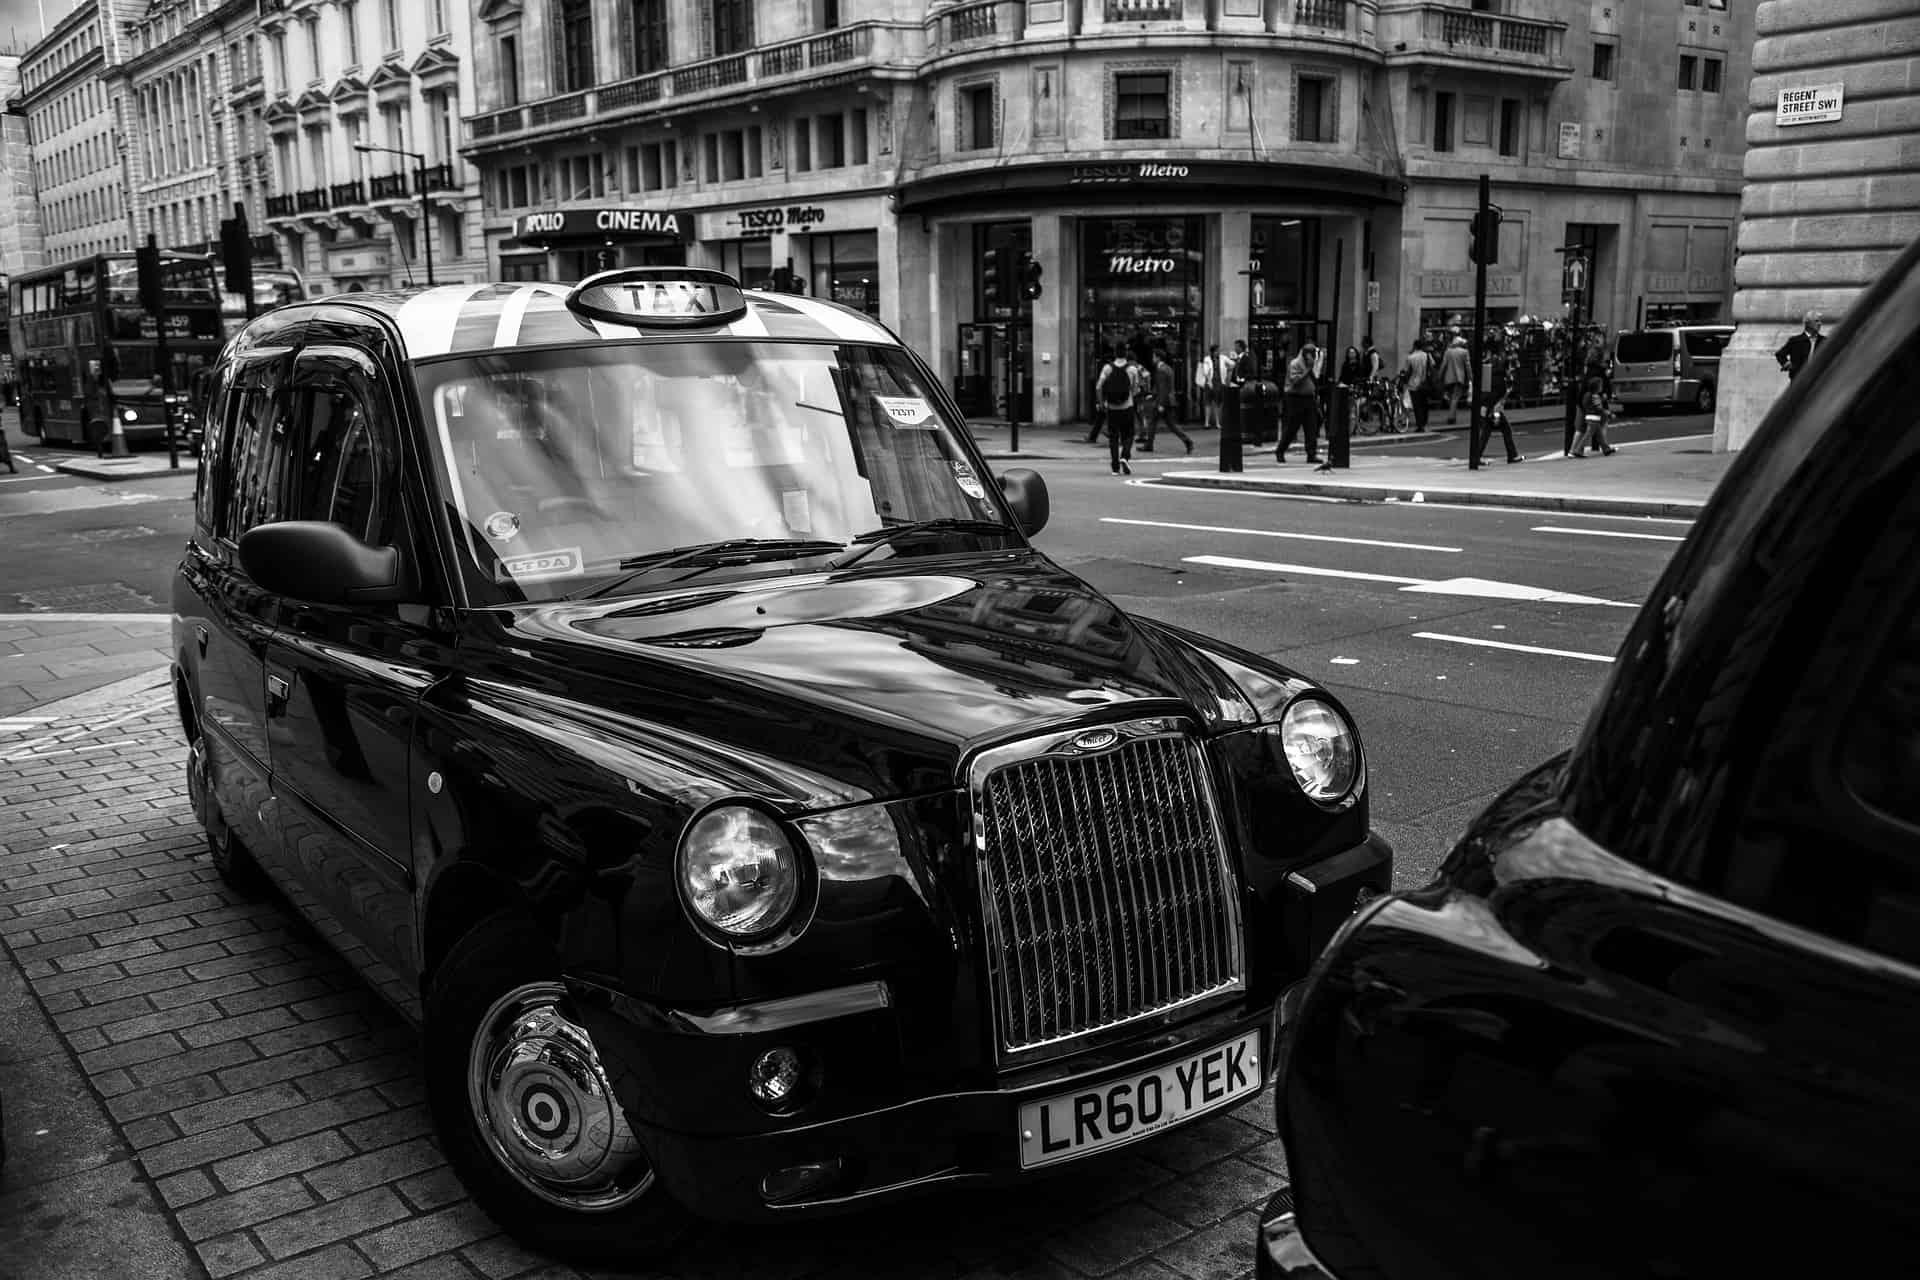 black_cab_taxi_nero_londra